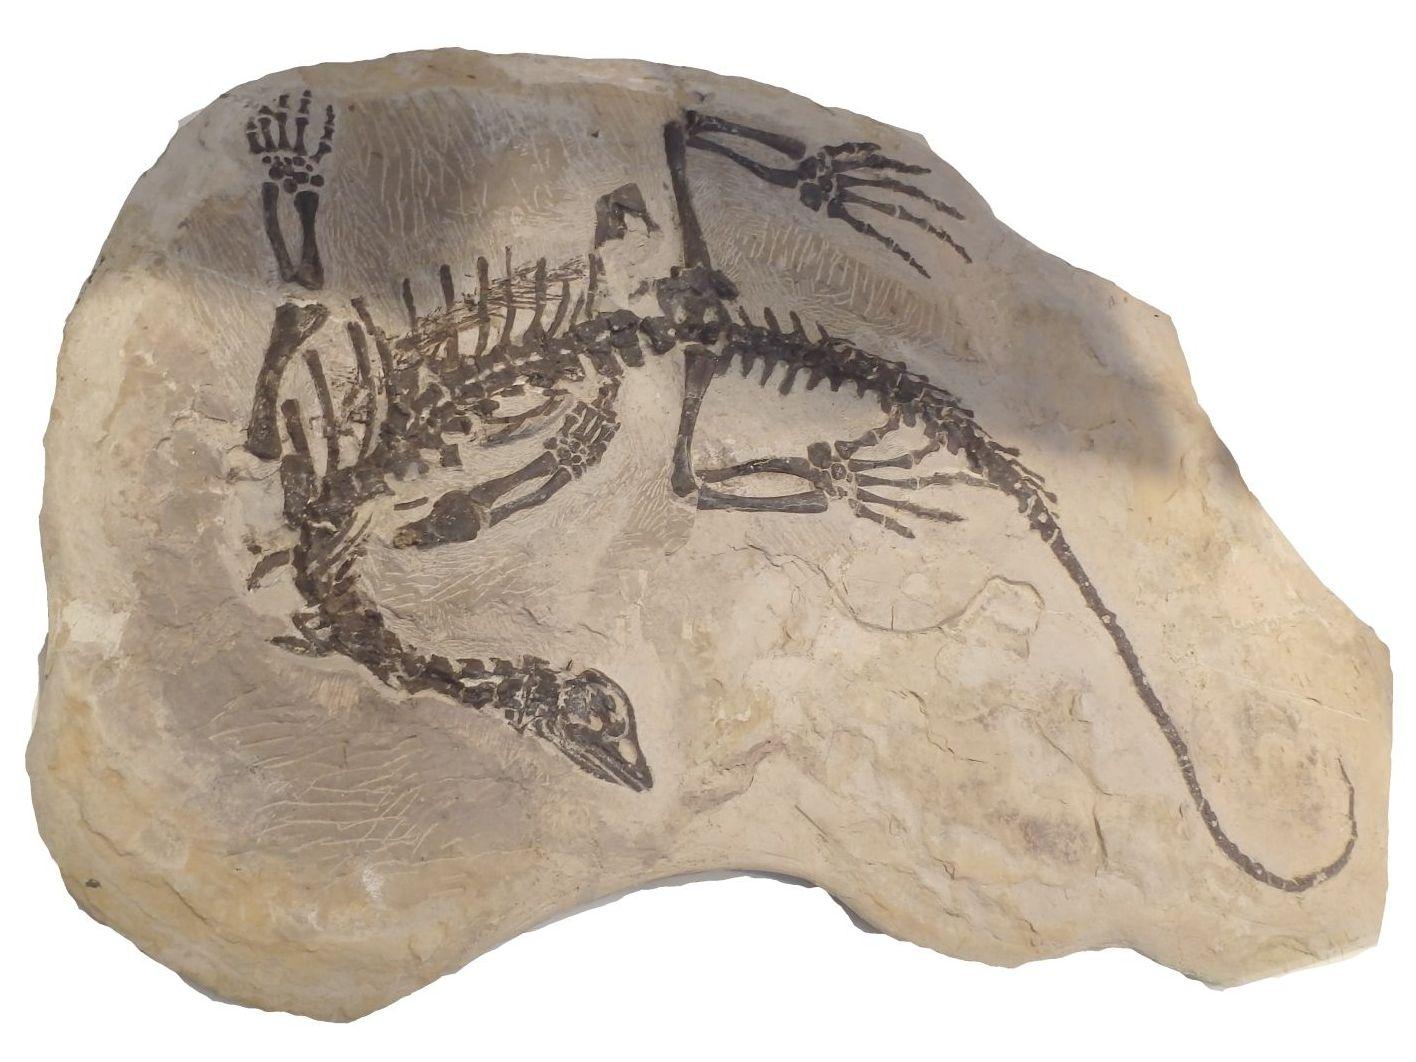 Claudiosaurus-germaini-Perm-Ramolira-Morondava-Badin-Madagaskar